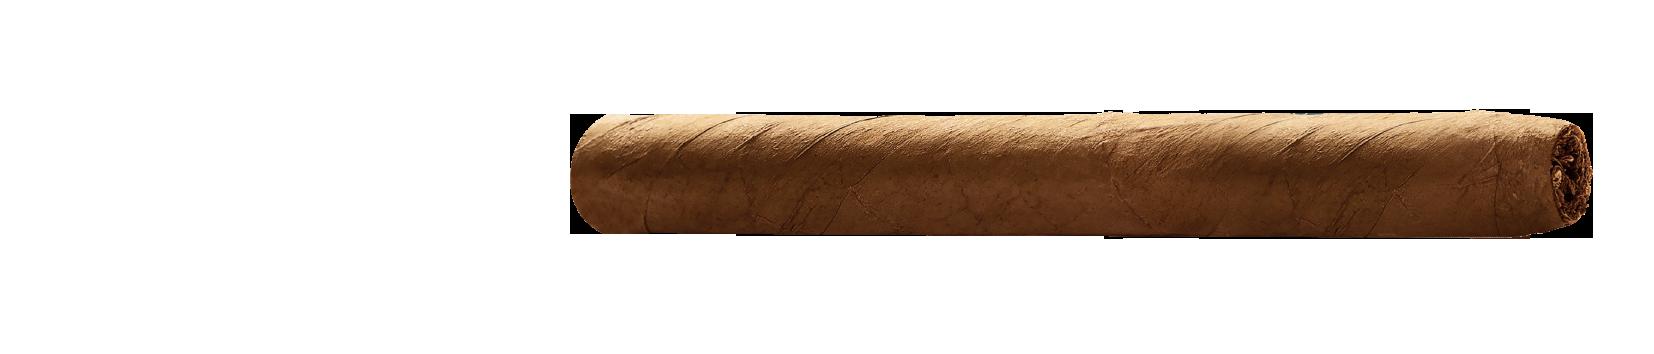 DANNEMANN Tobacco • Excellence • Craft - content image